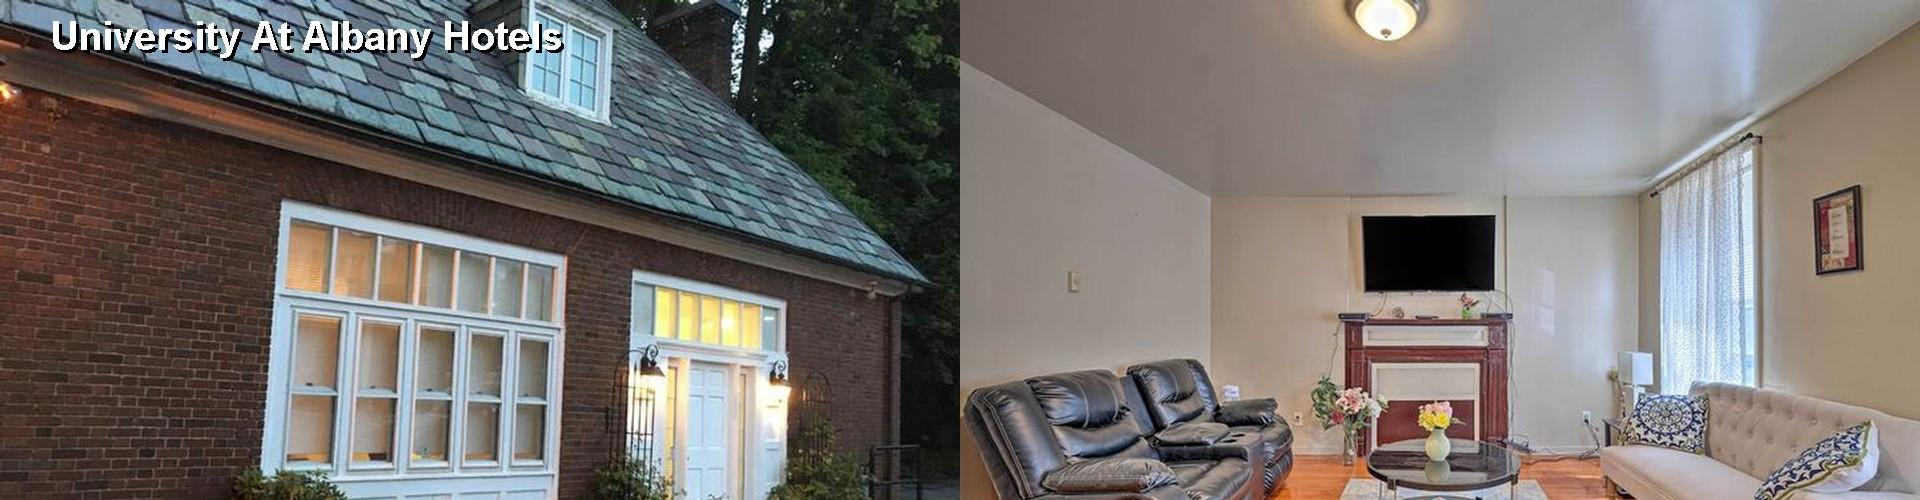 5 Best Hotels Near University At Albany